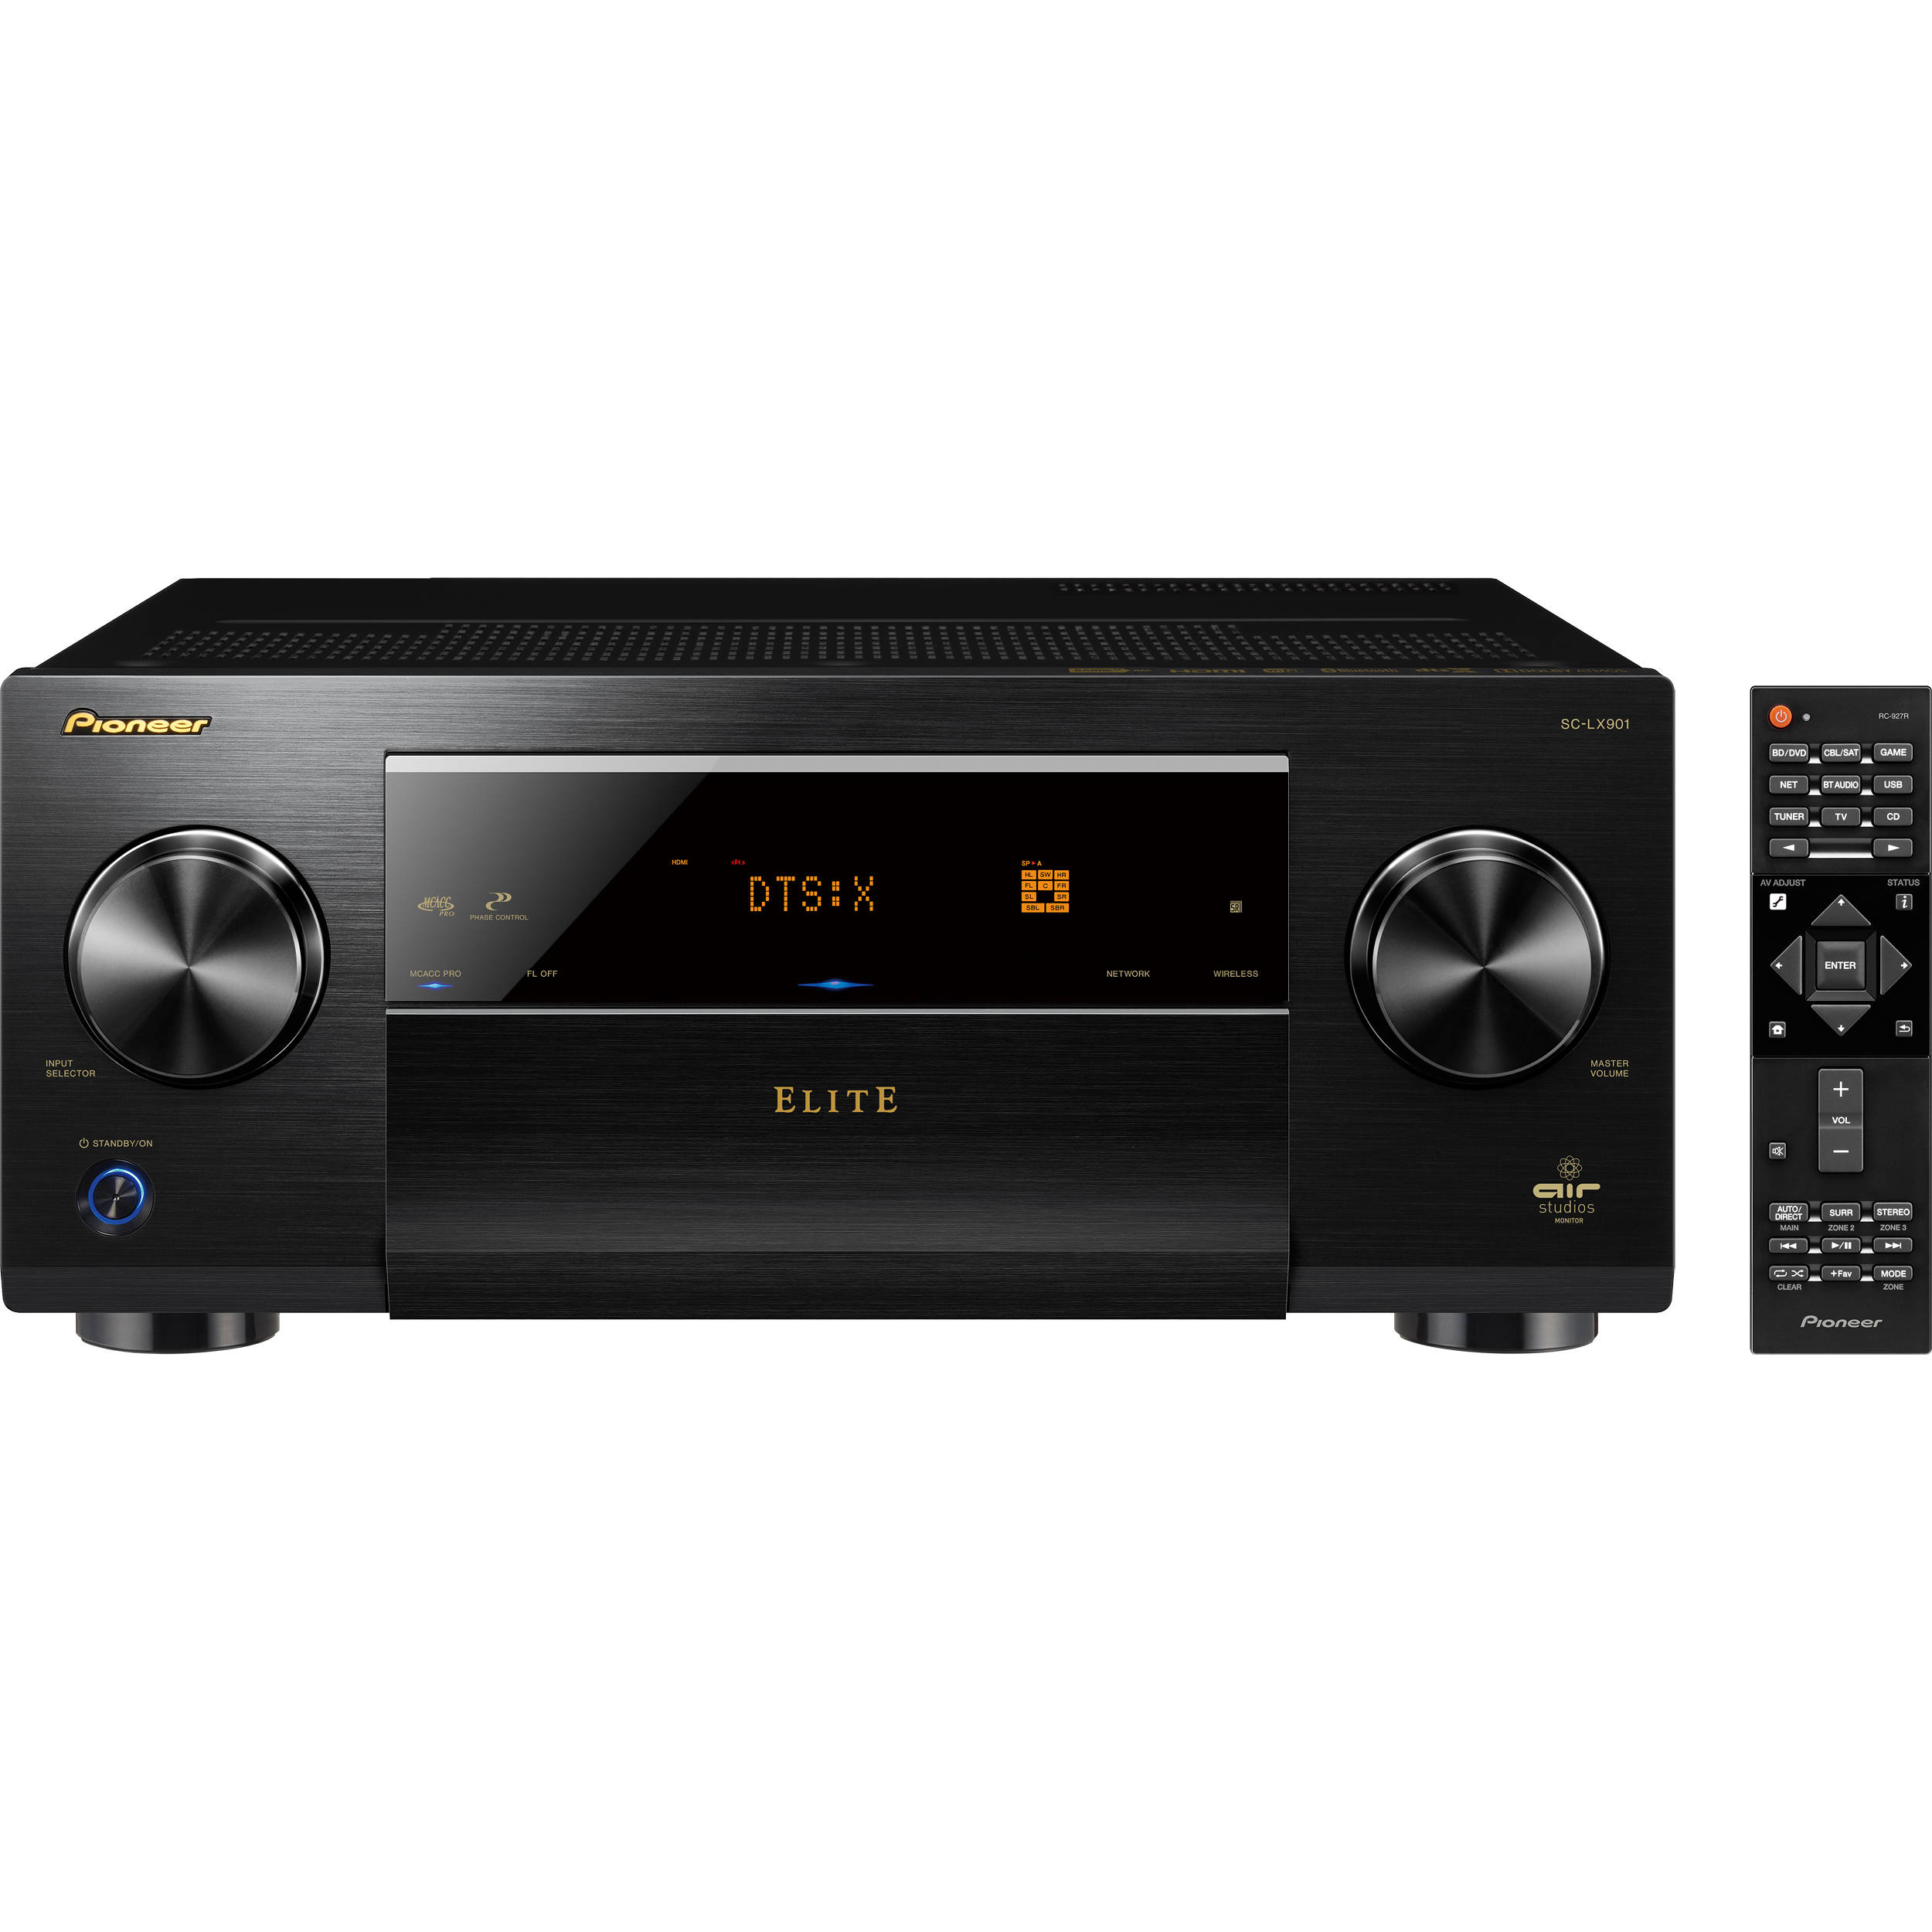 AV receiver: description, purpose